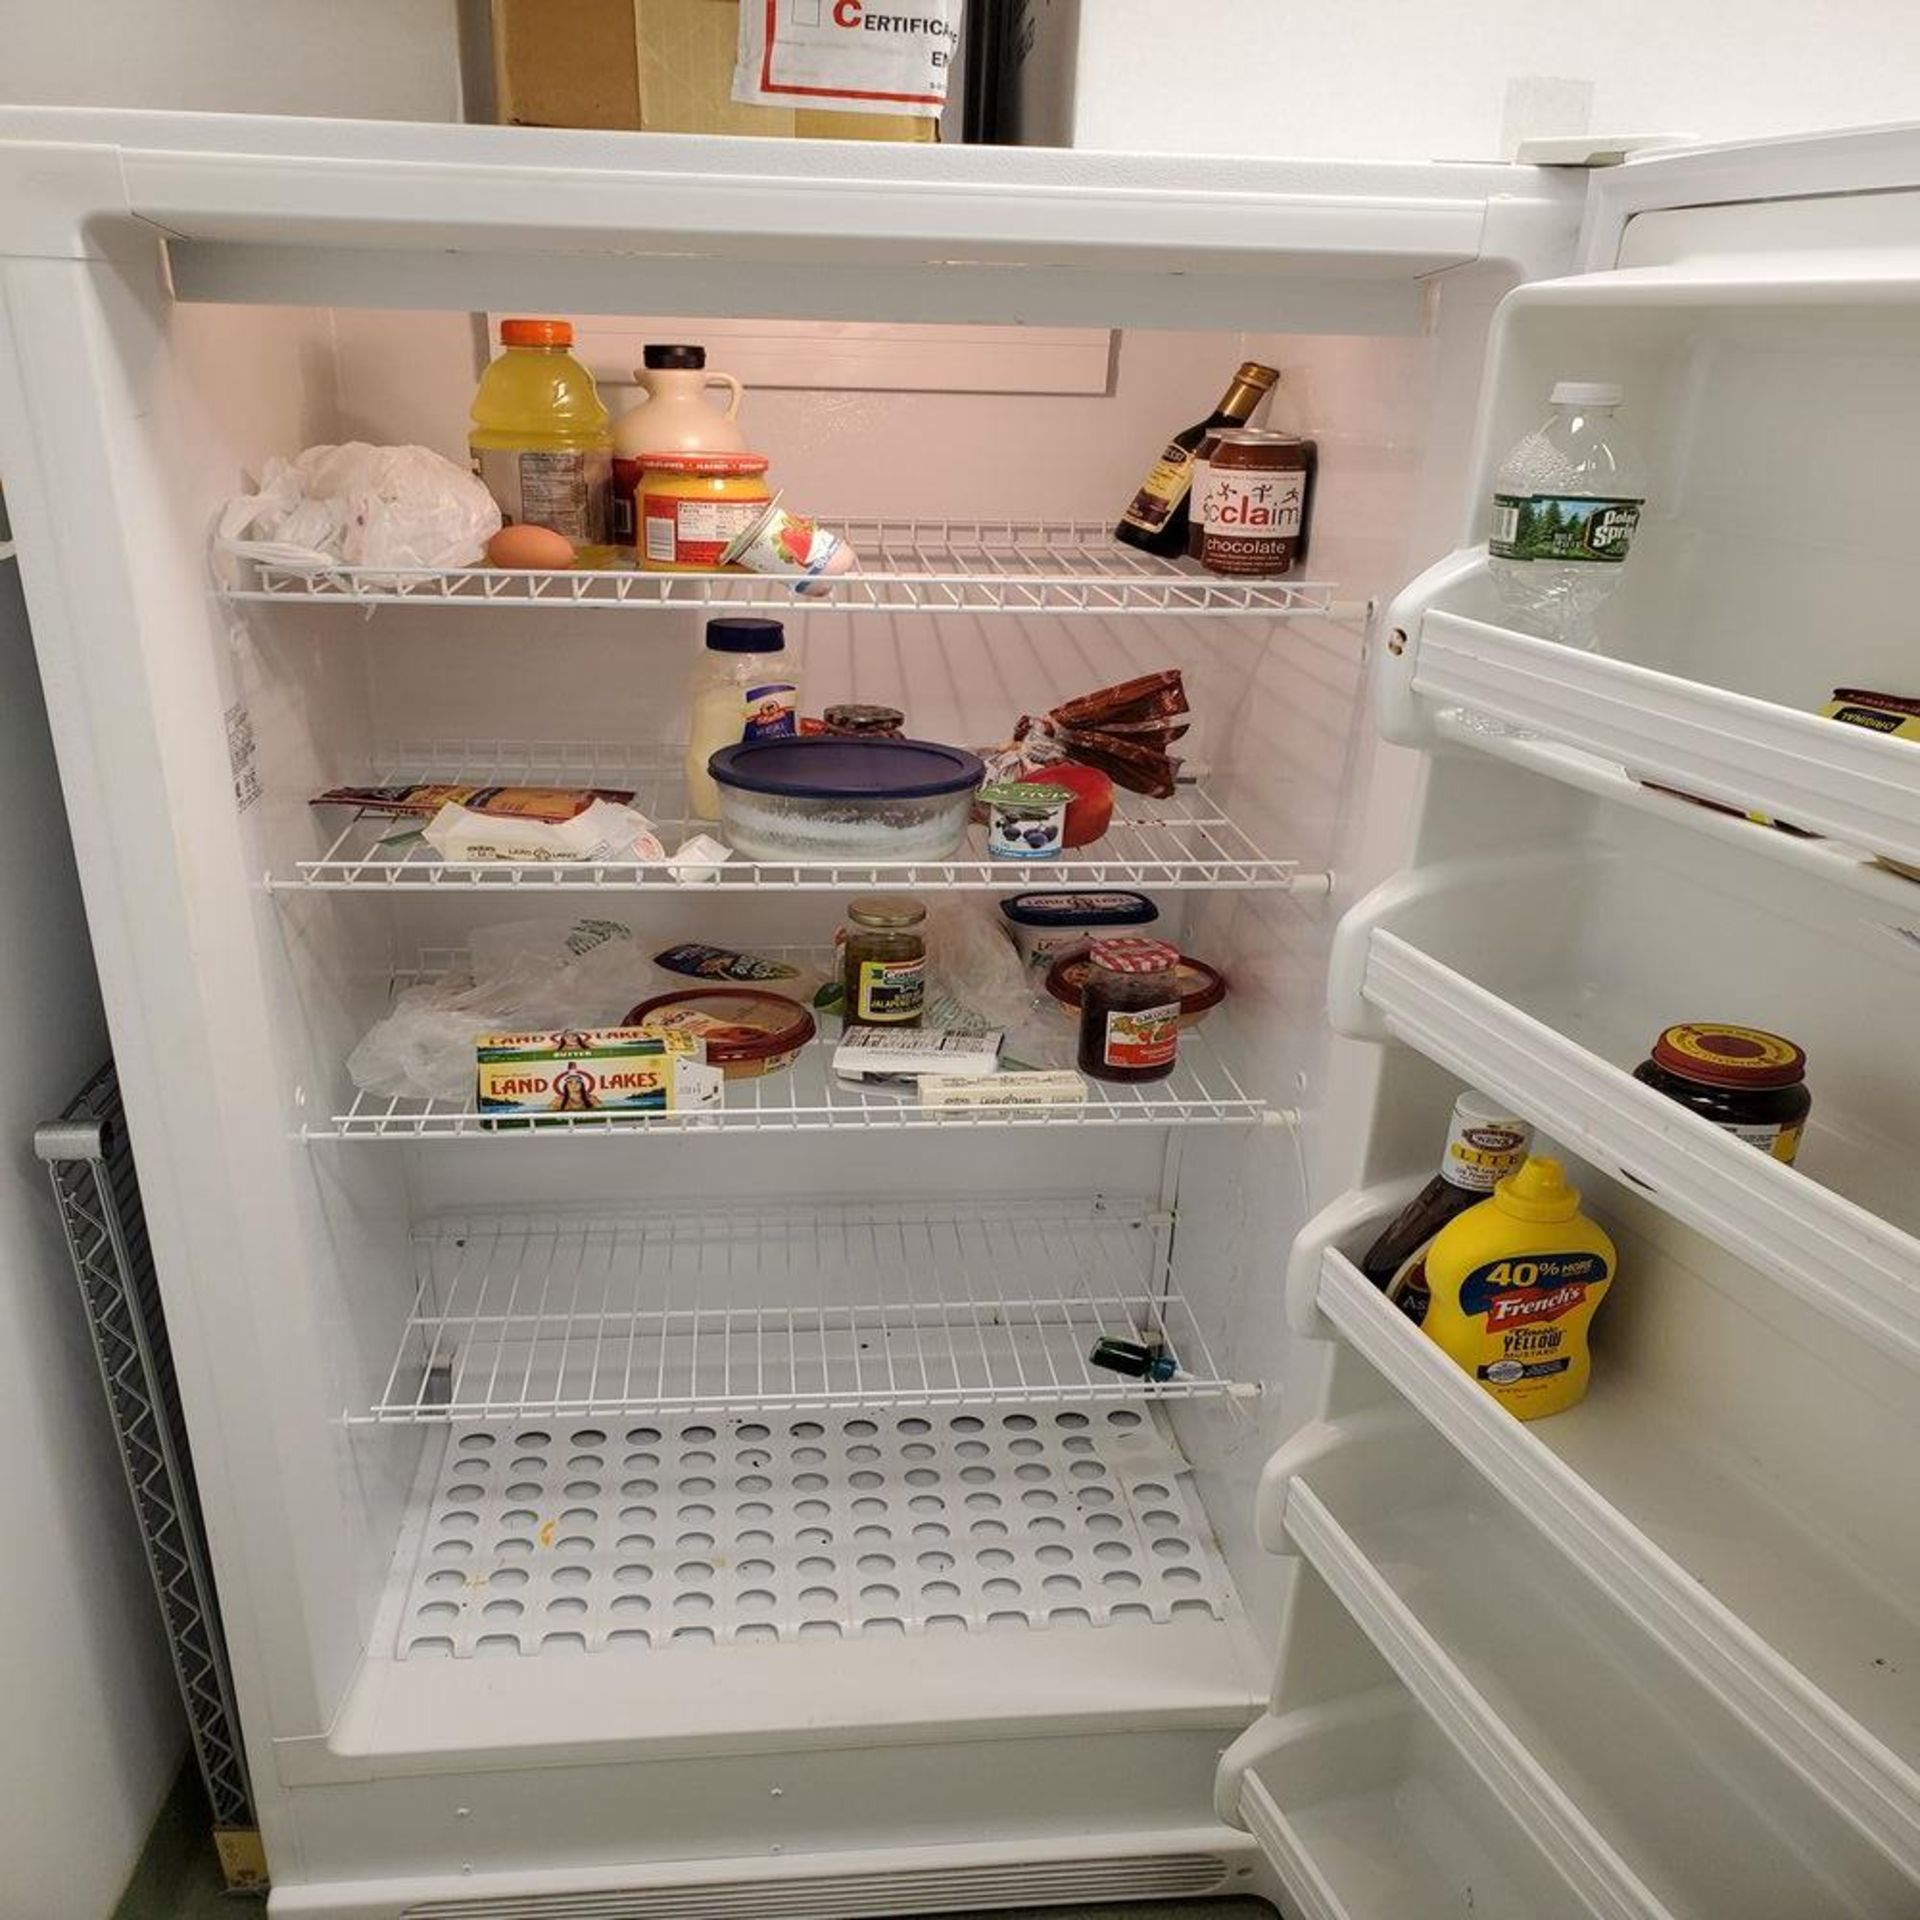 Kenmore Refrigerator - Image 2 of 3